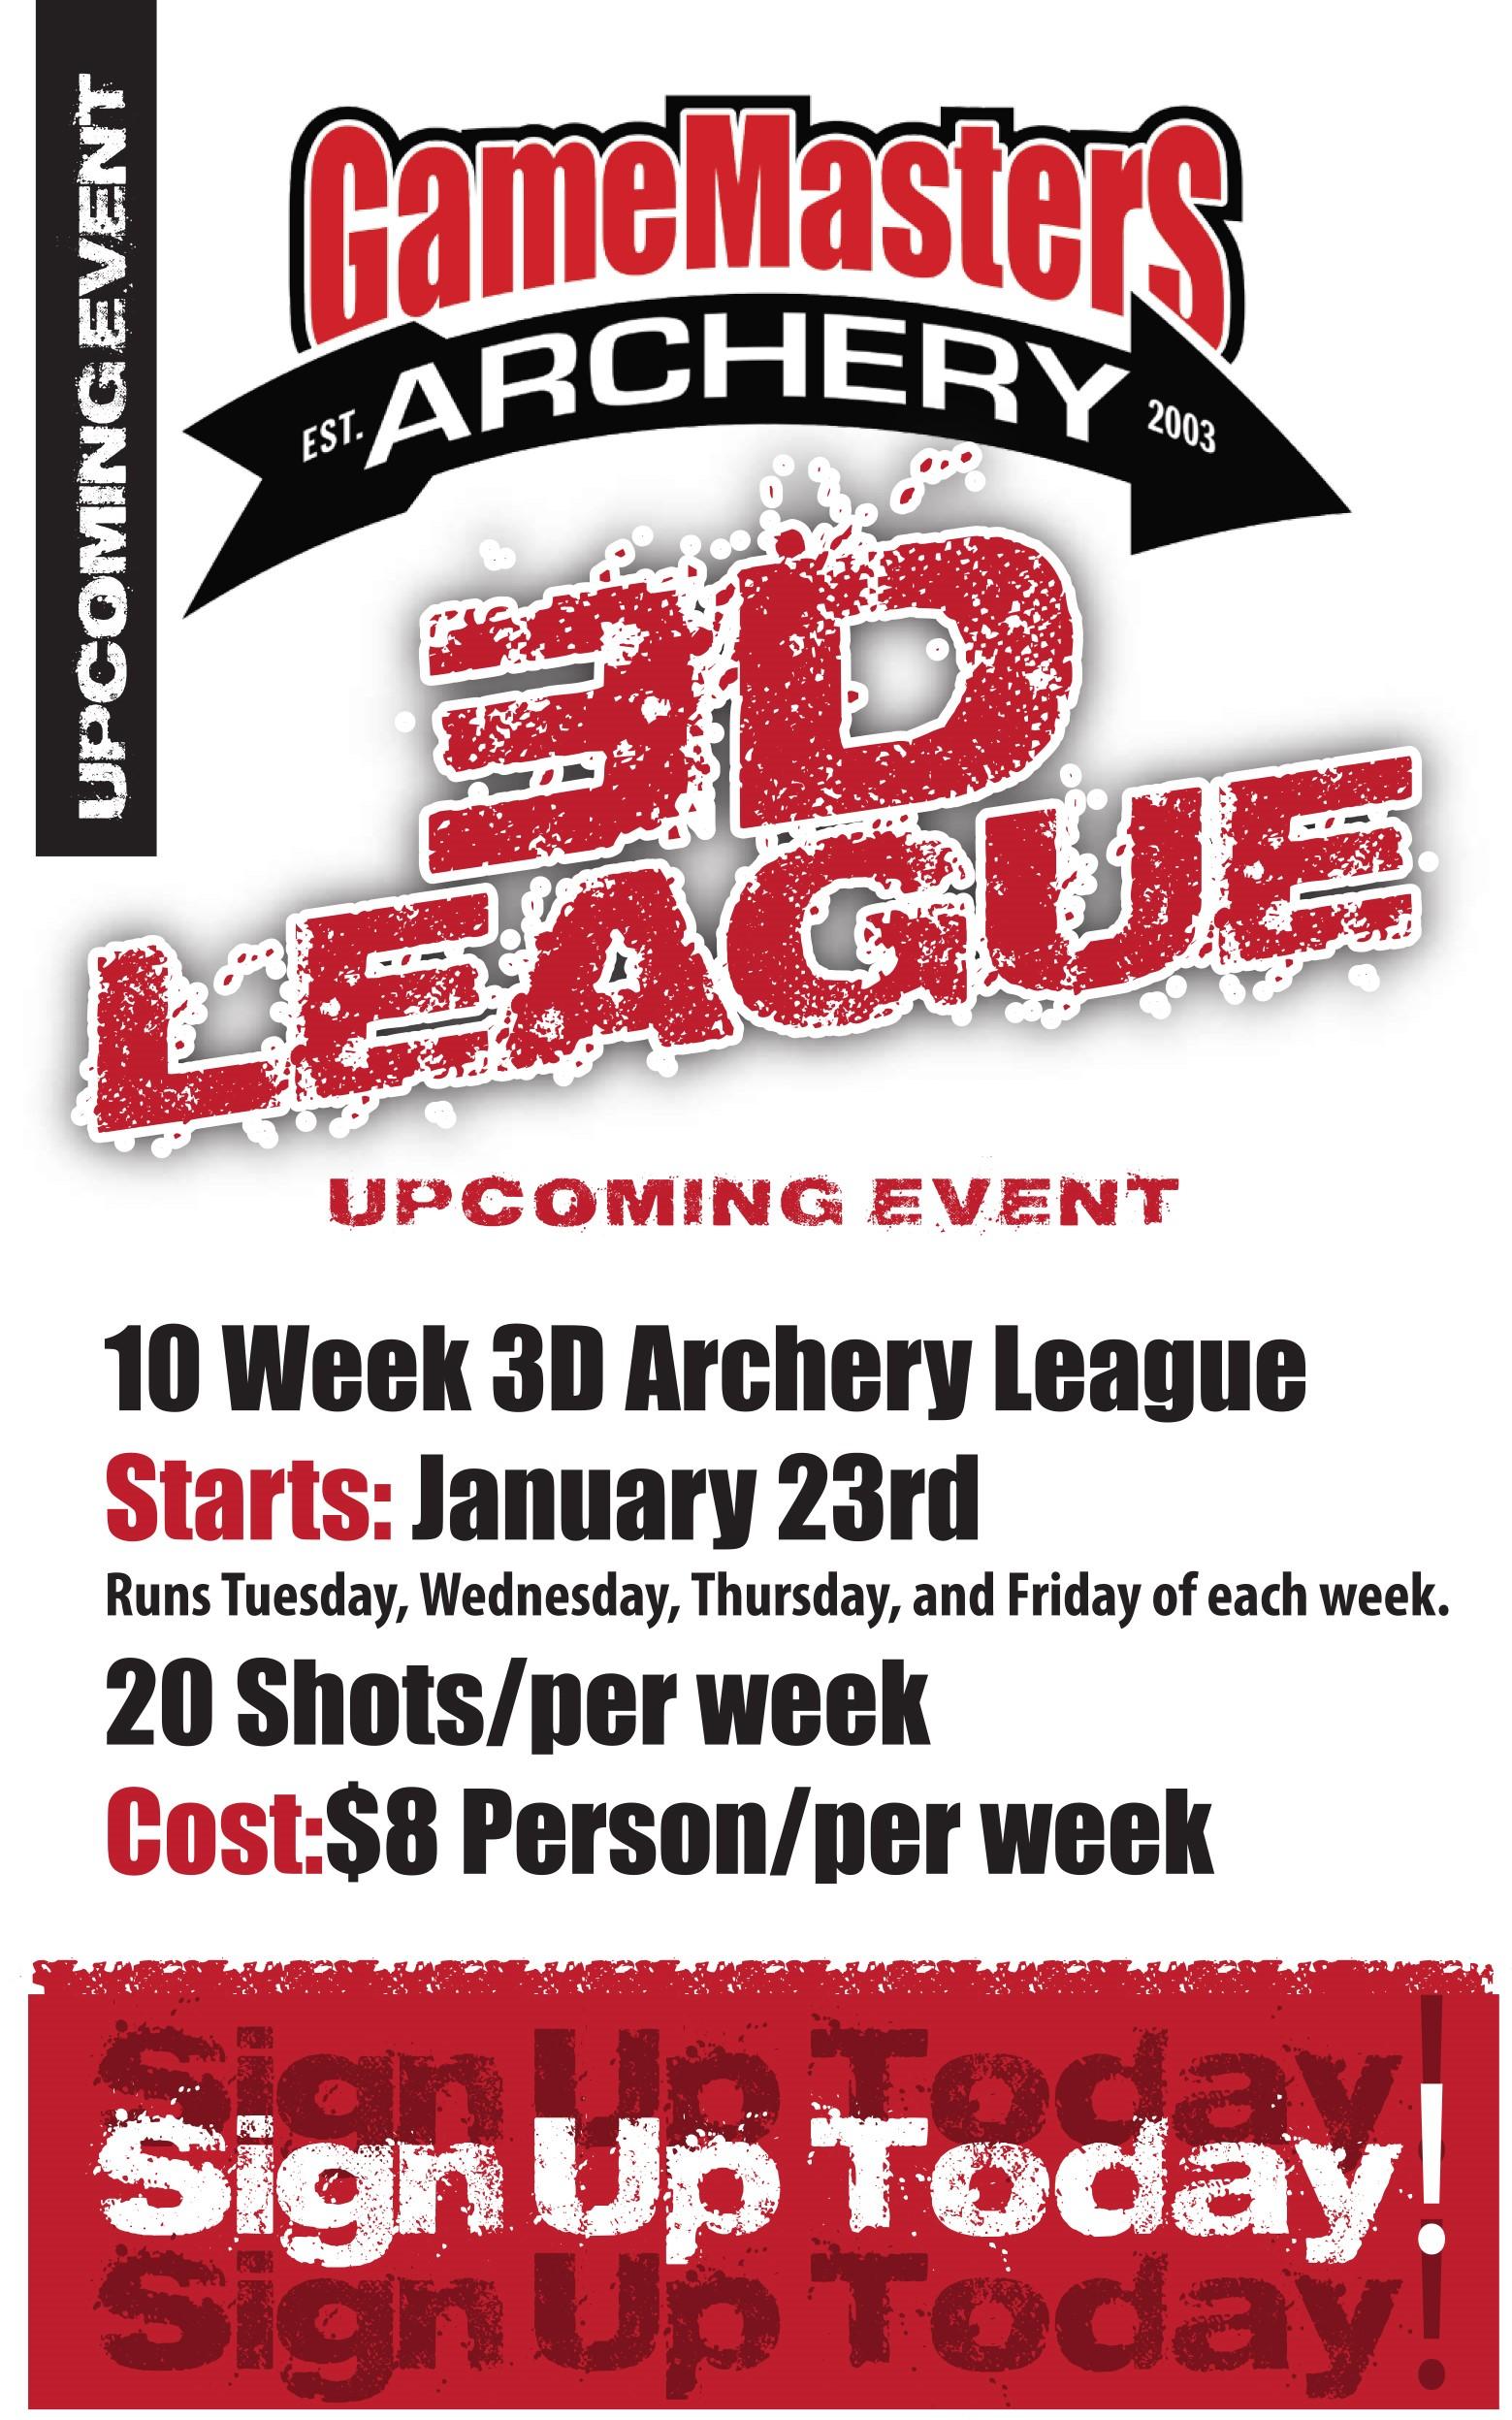 archery-league-info.jpg